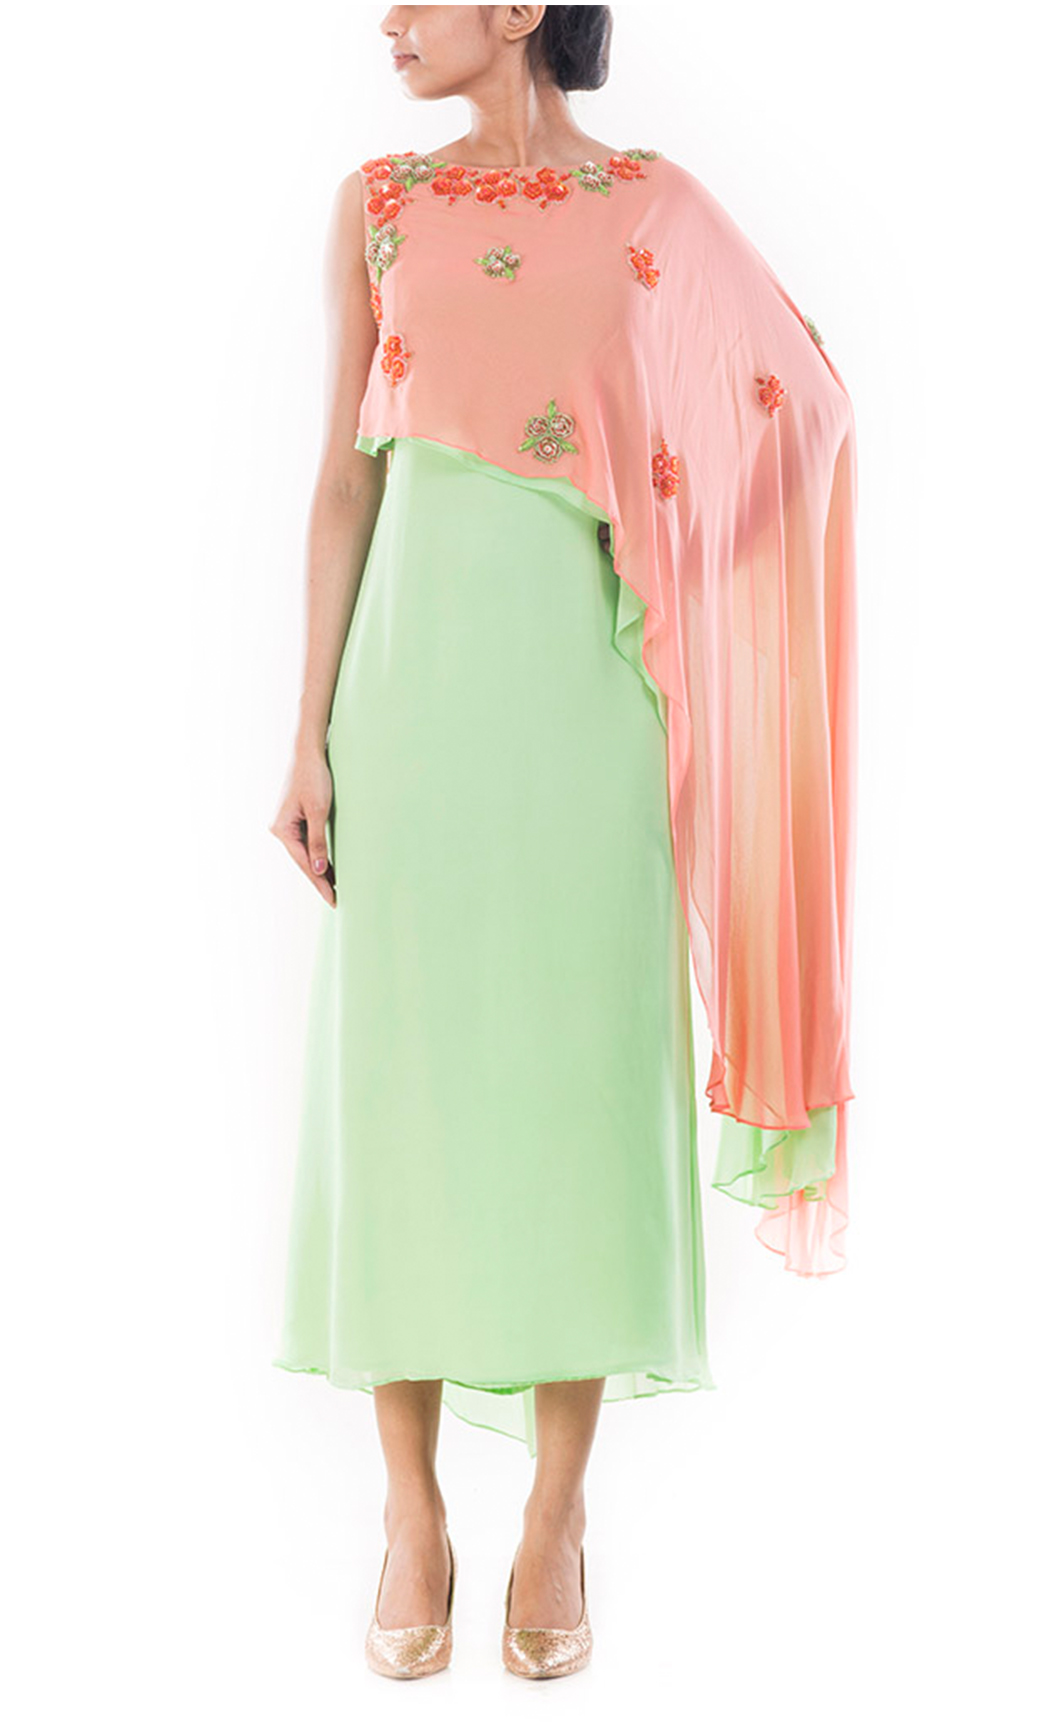 Spring Green Pearl Dress